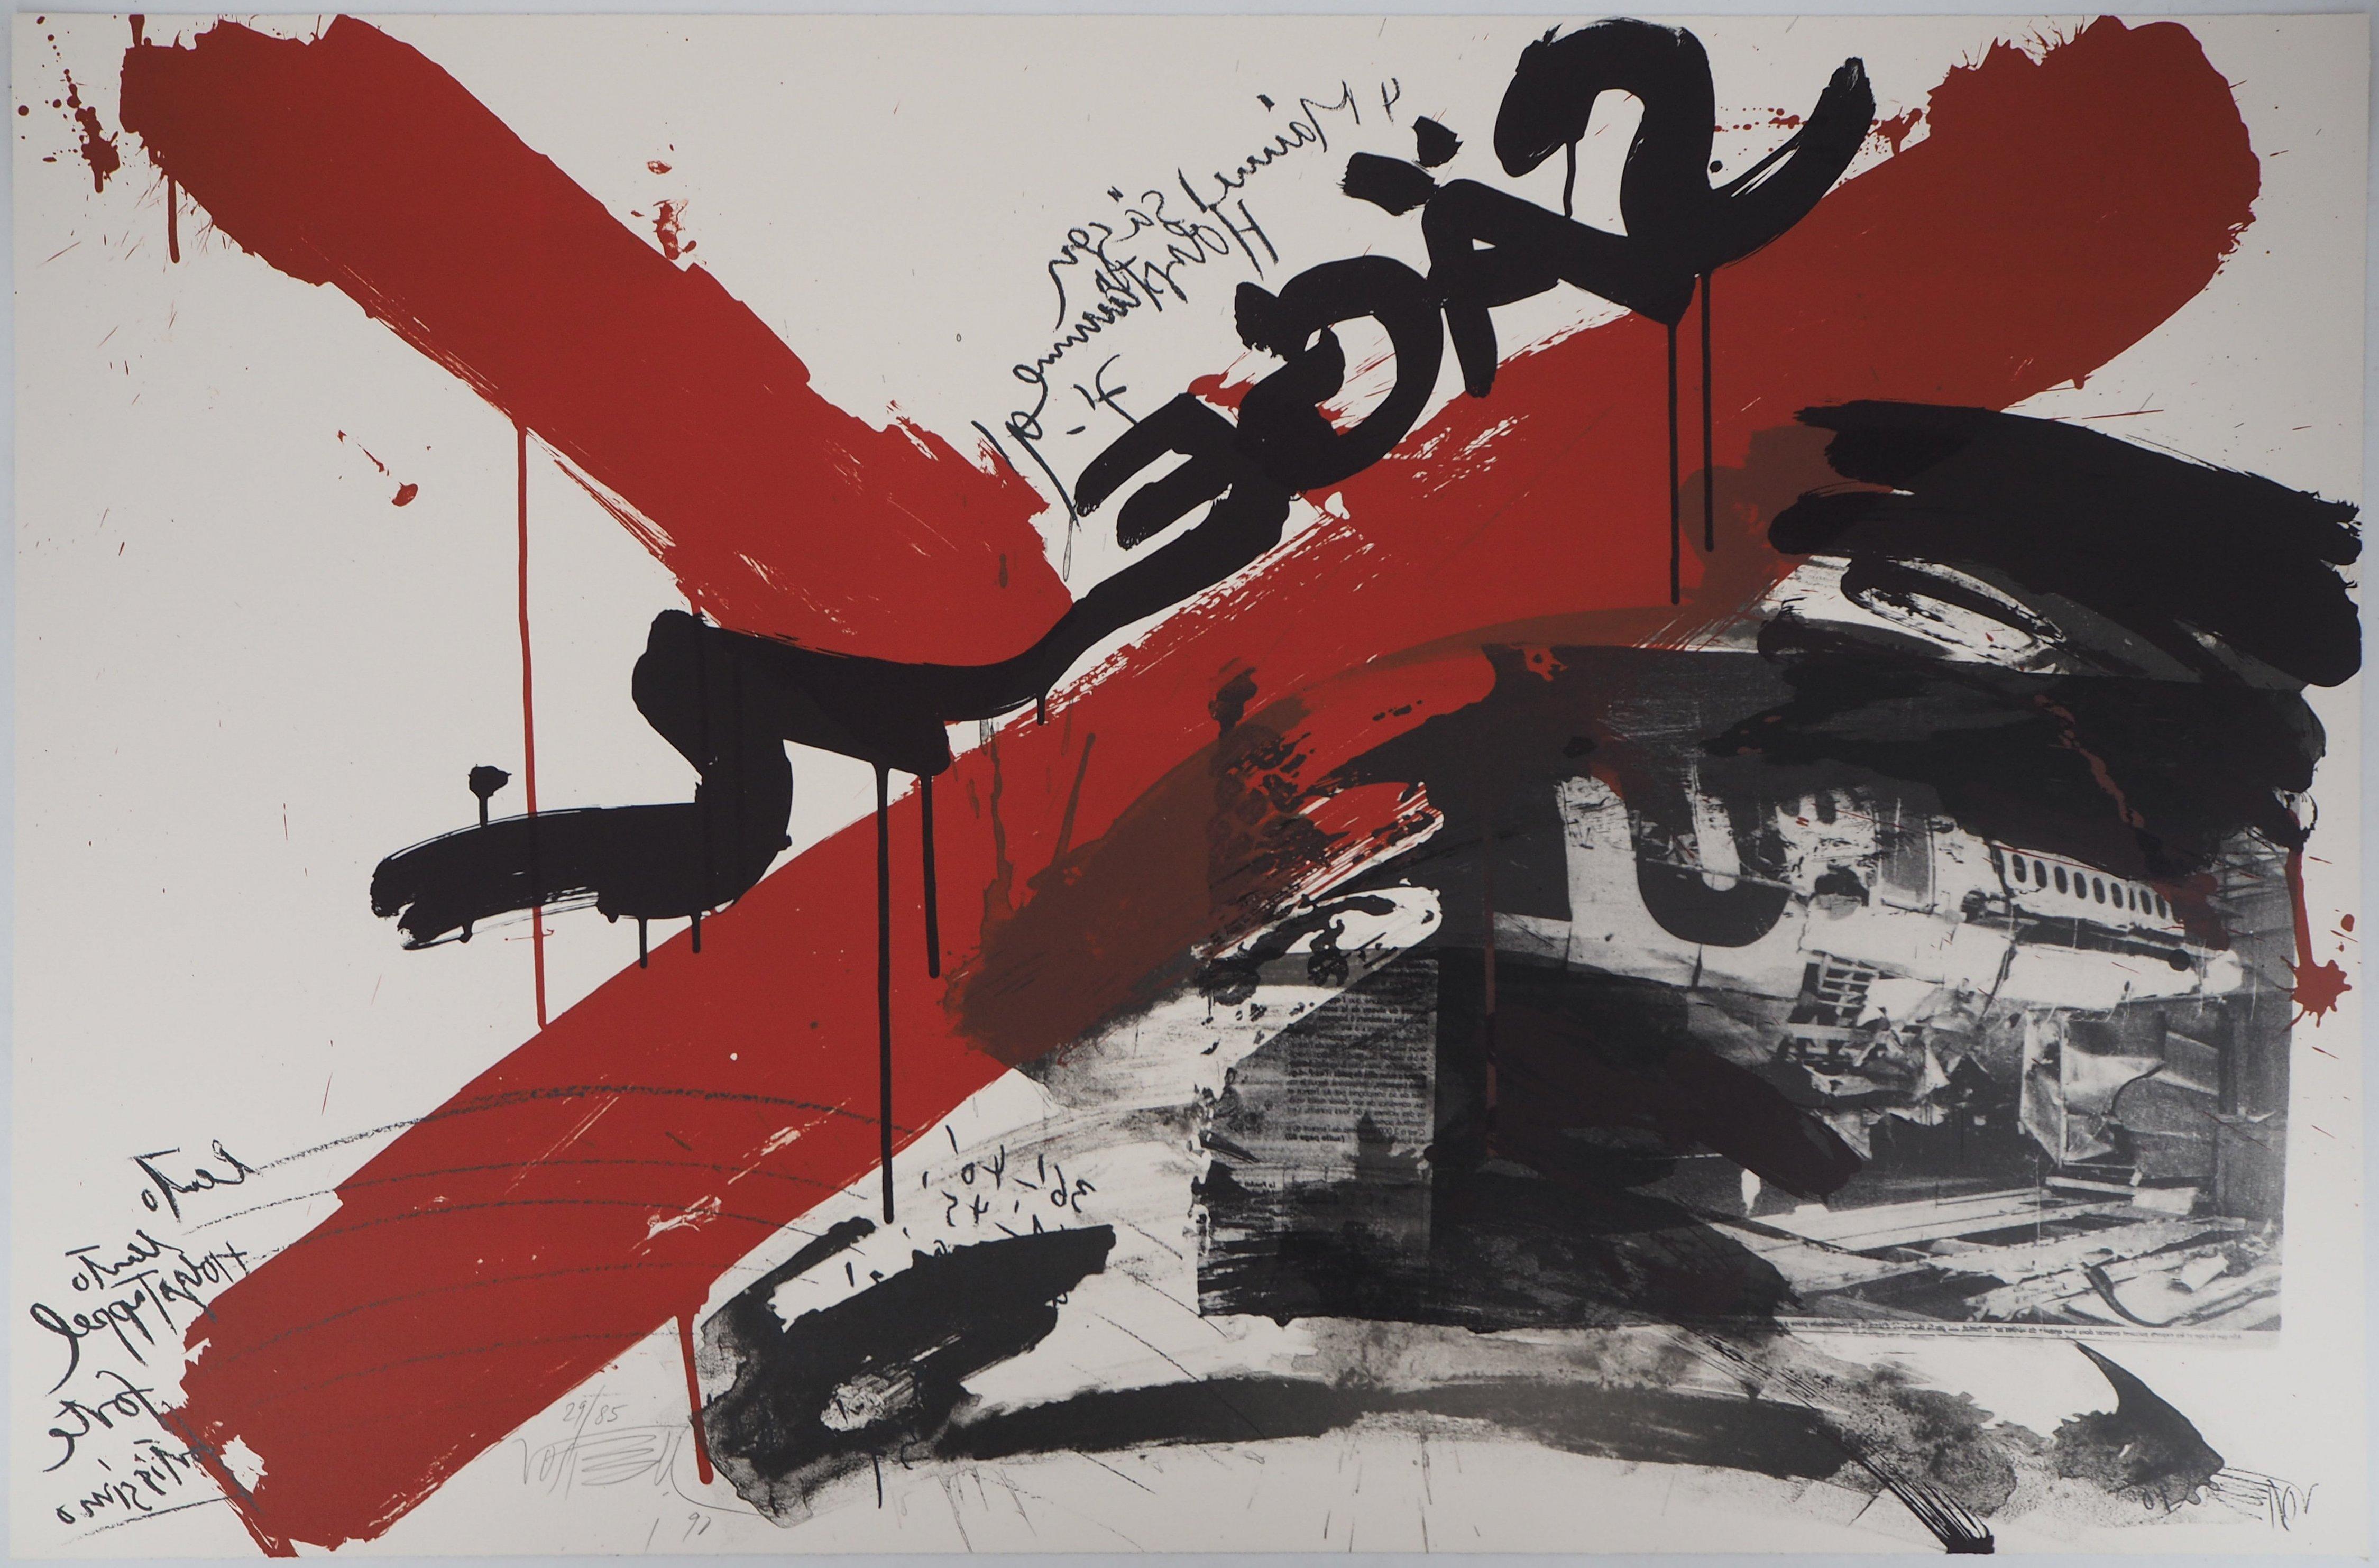 The Scream,  The Accident - Original handsigned lithograph - Ltd 85 cop (Fluxus)